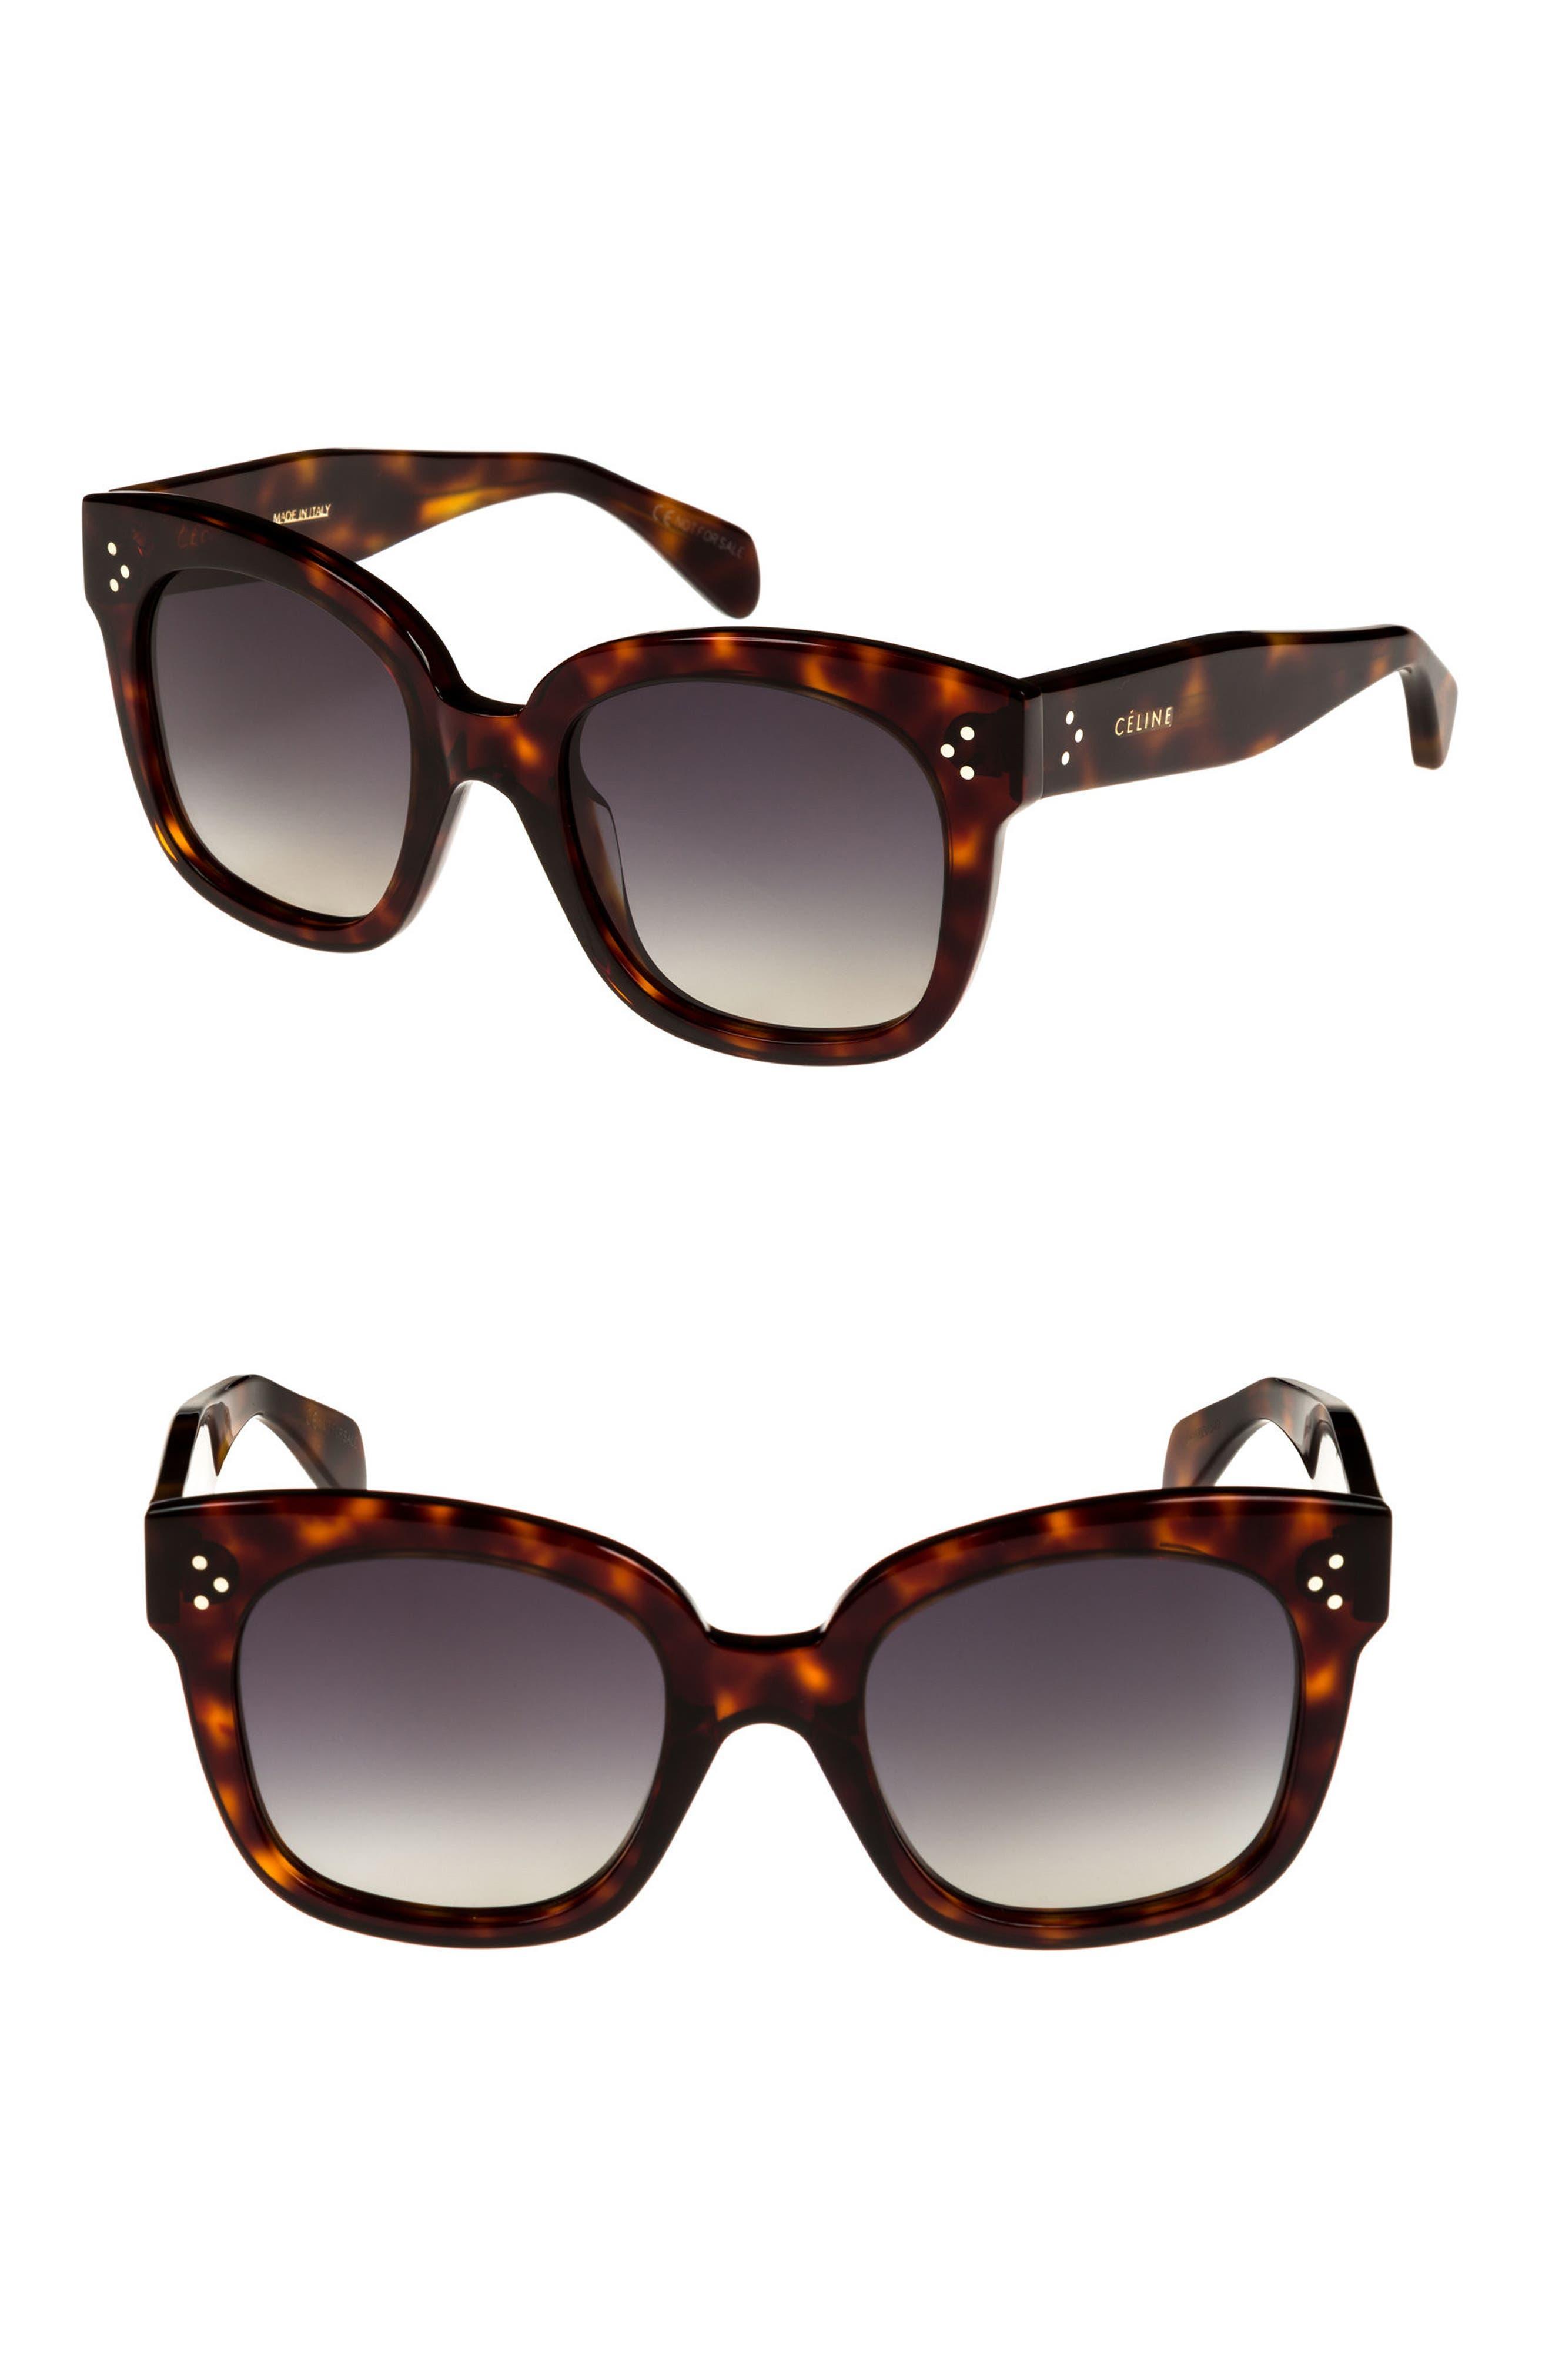 54mm Square Sunglasses,                             Alternate thumbnail 2, color,                             RED HAVAN/ SMOKE